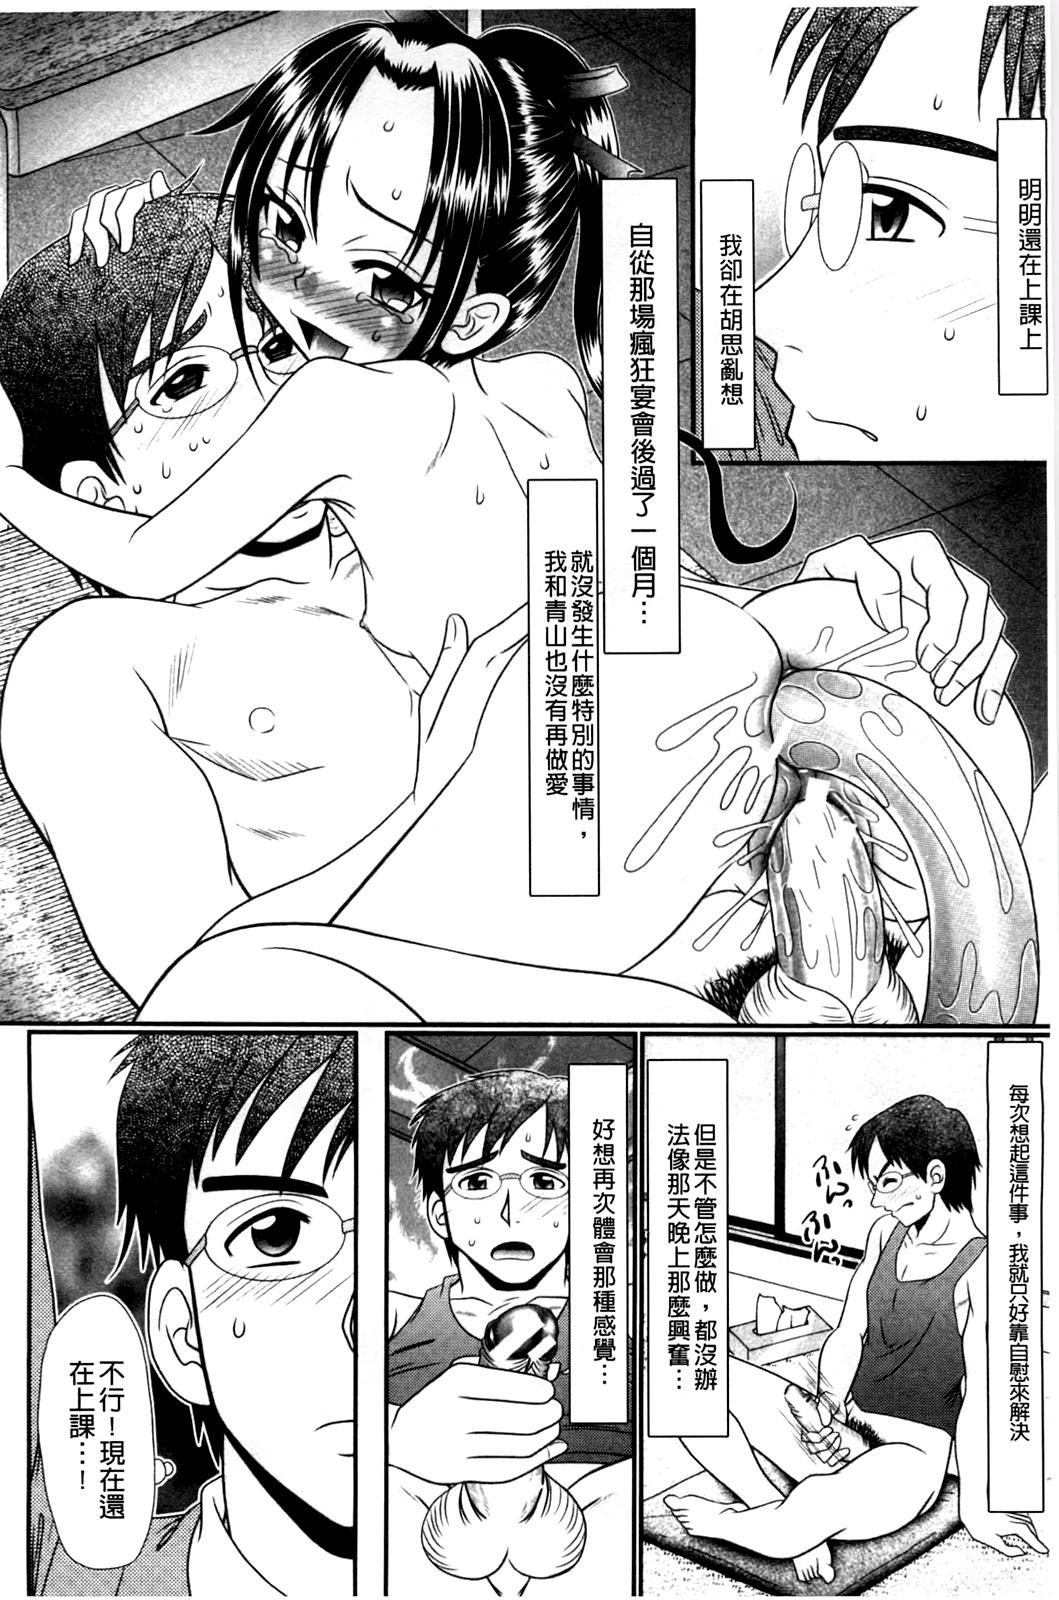 Higyaku Kyoushitsu 46